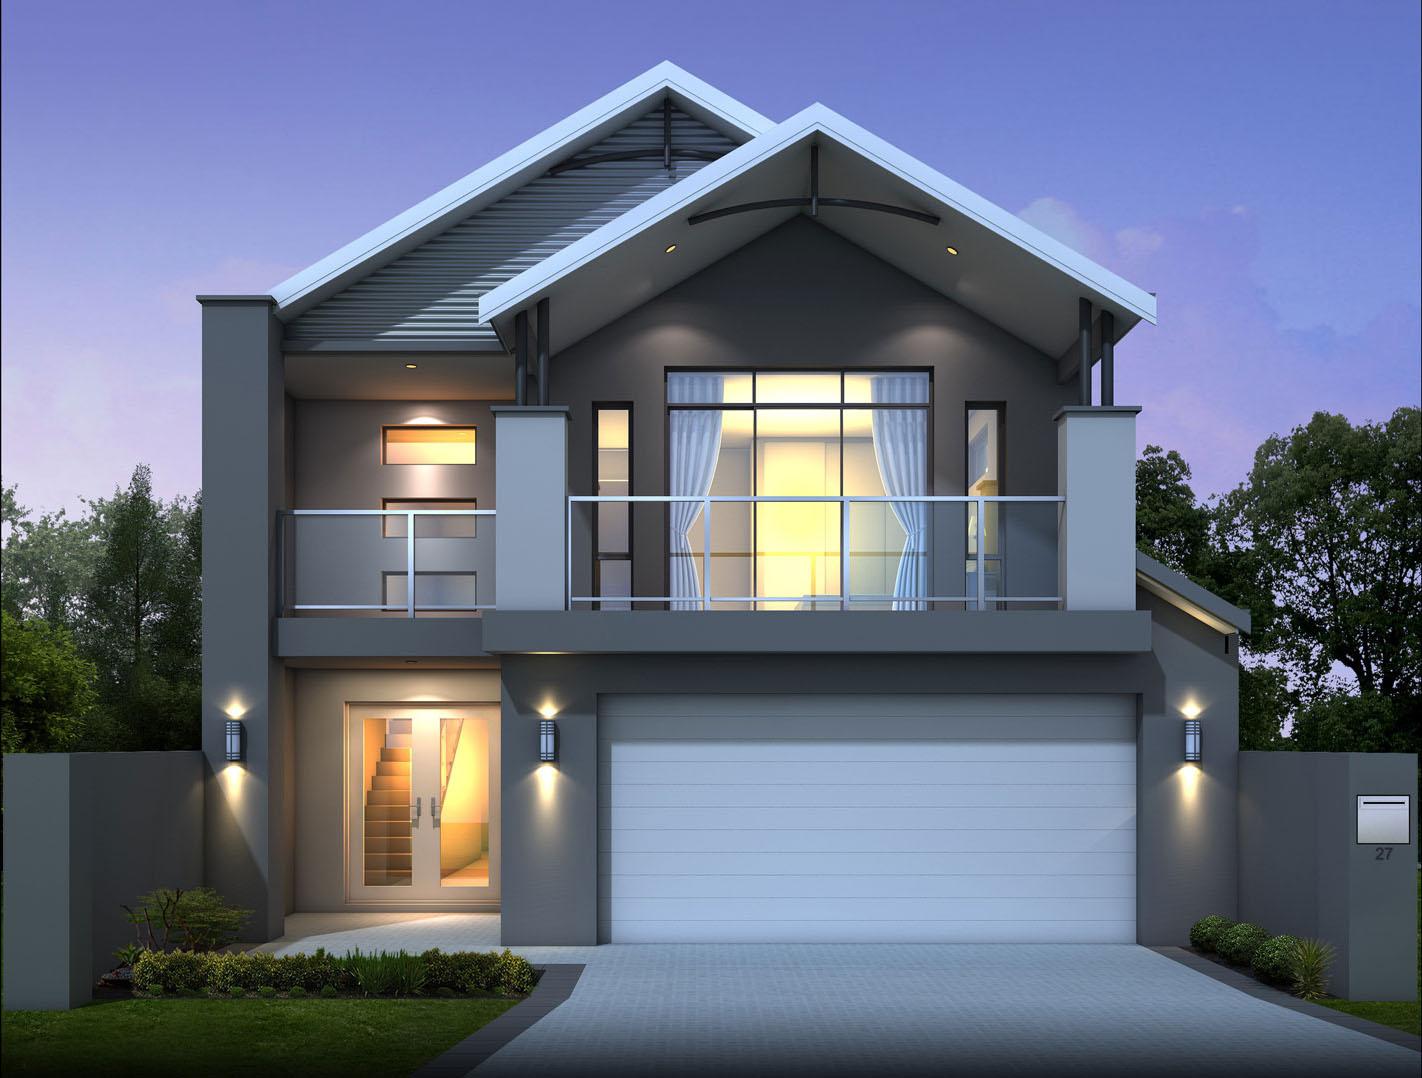 island retreat grande series 2 storey homes two storey homes. Black Bedroom Furniture Sets. Home Design Ideas